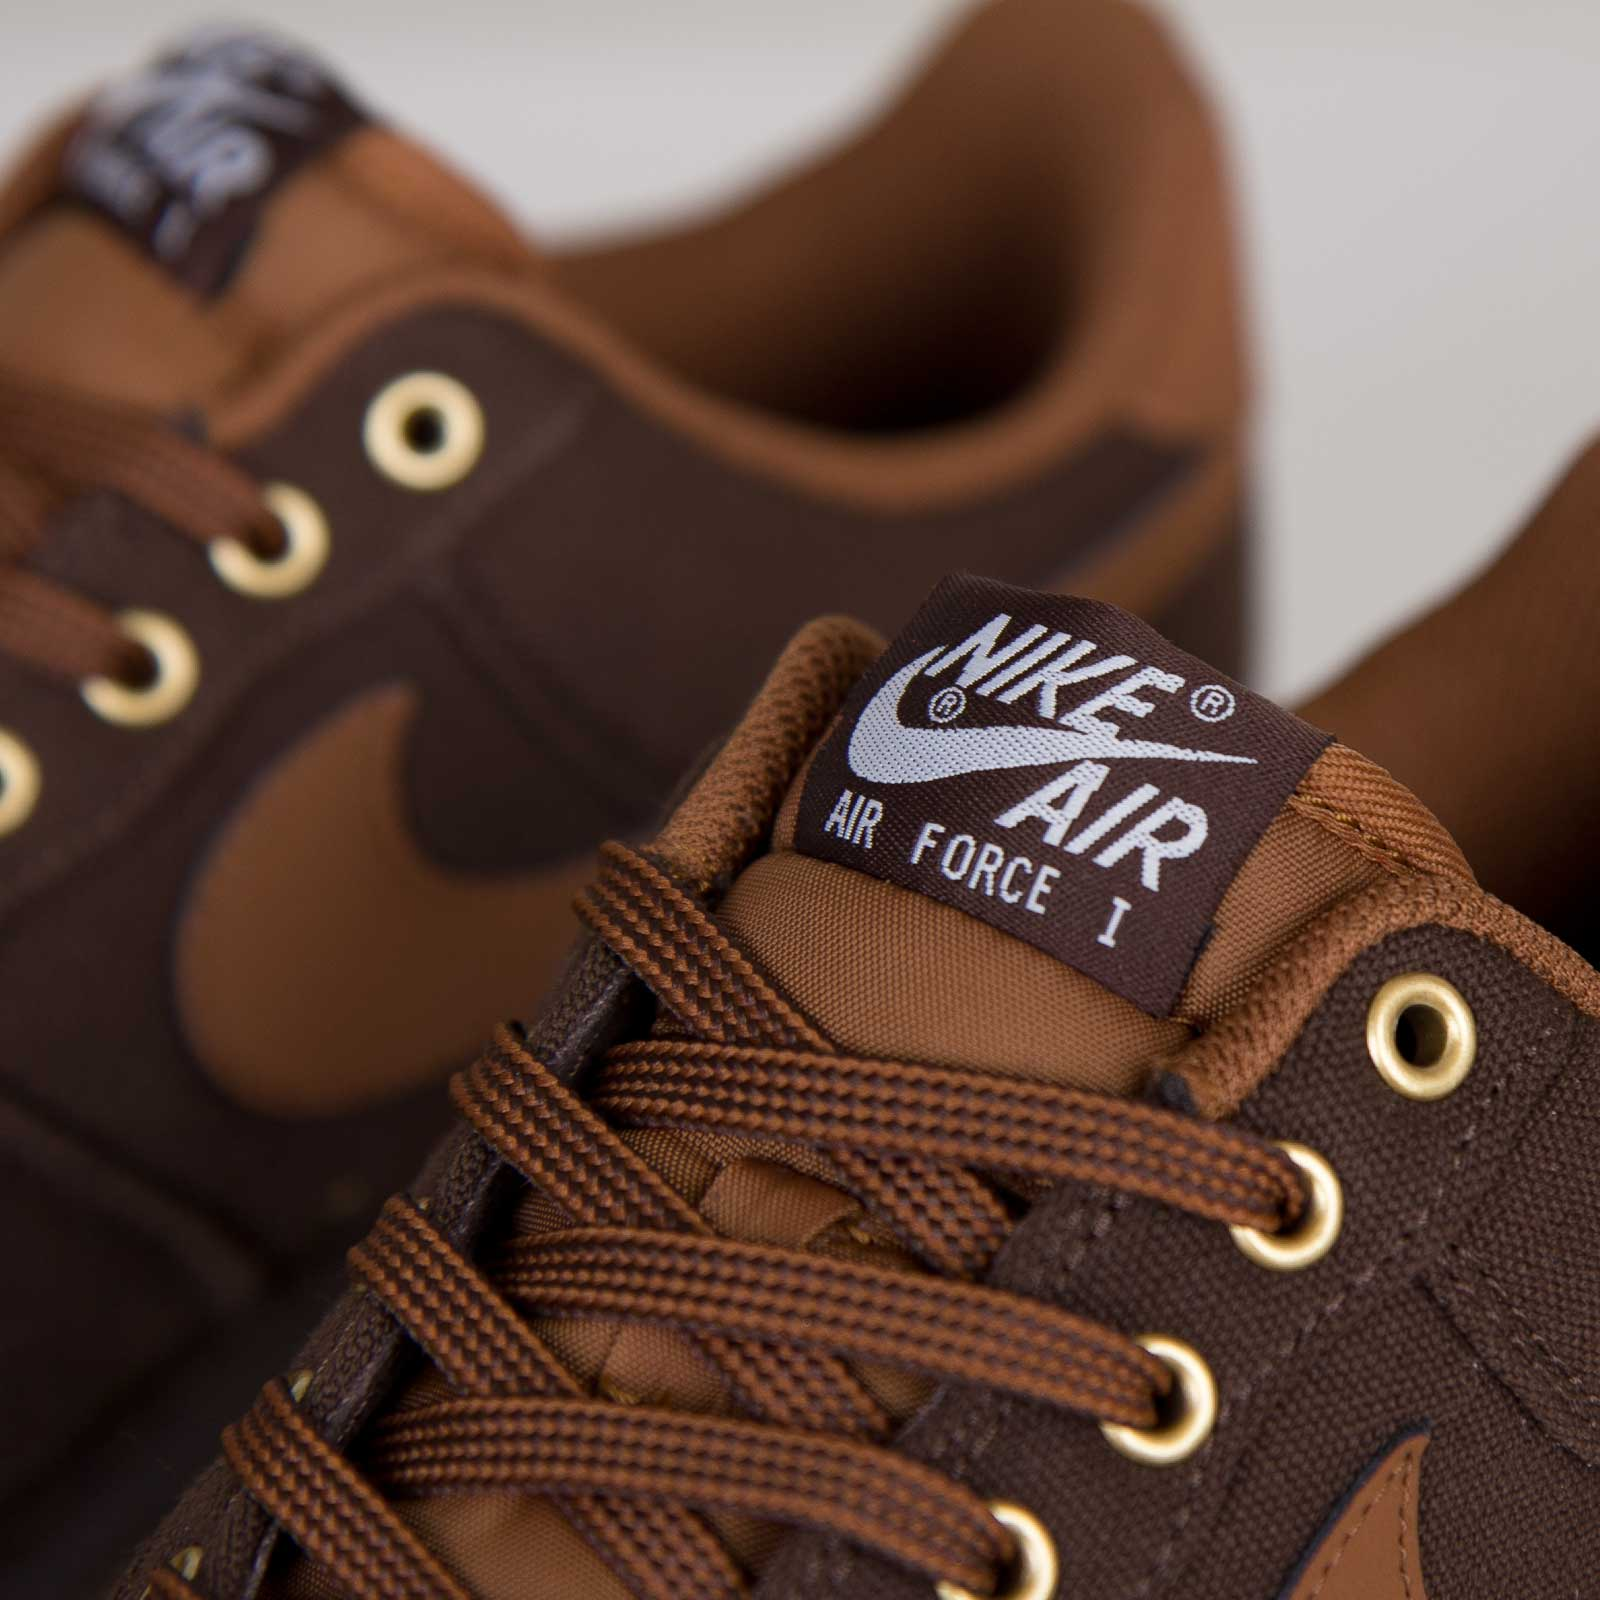 Nike Air Force 1 ´07 WW - 631412-200 - SNS | sneakers ...